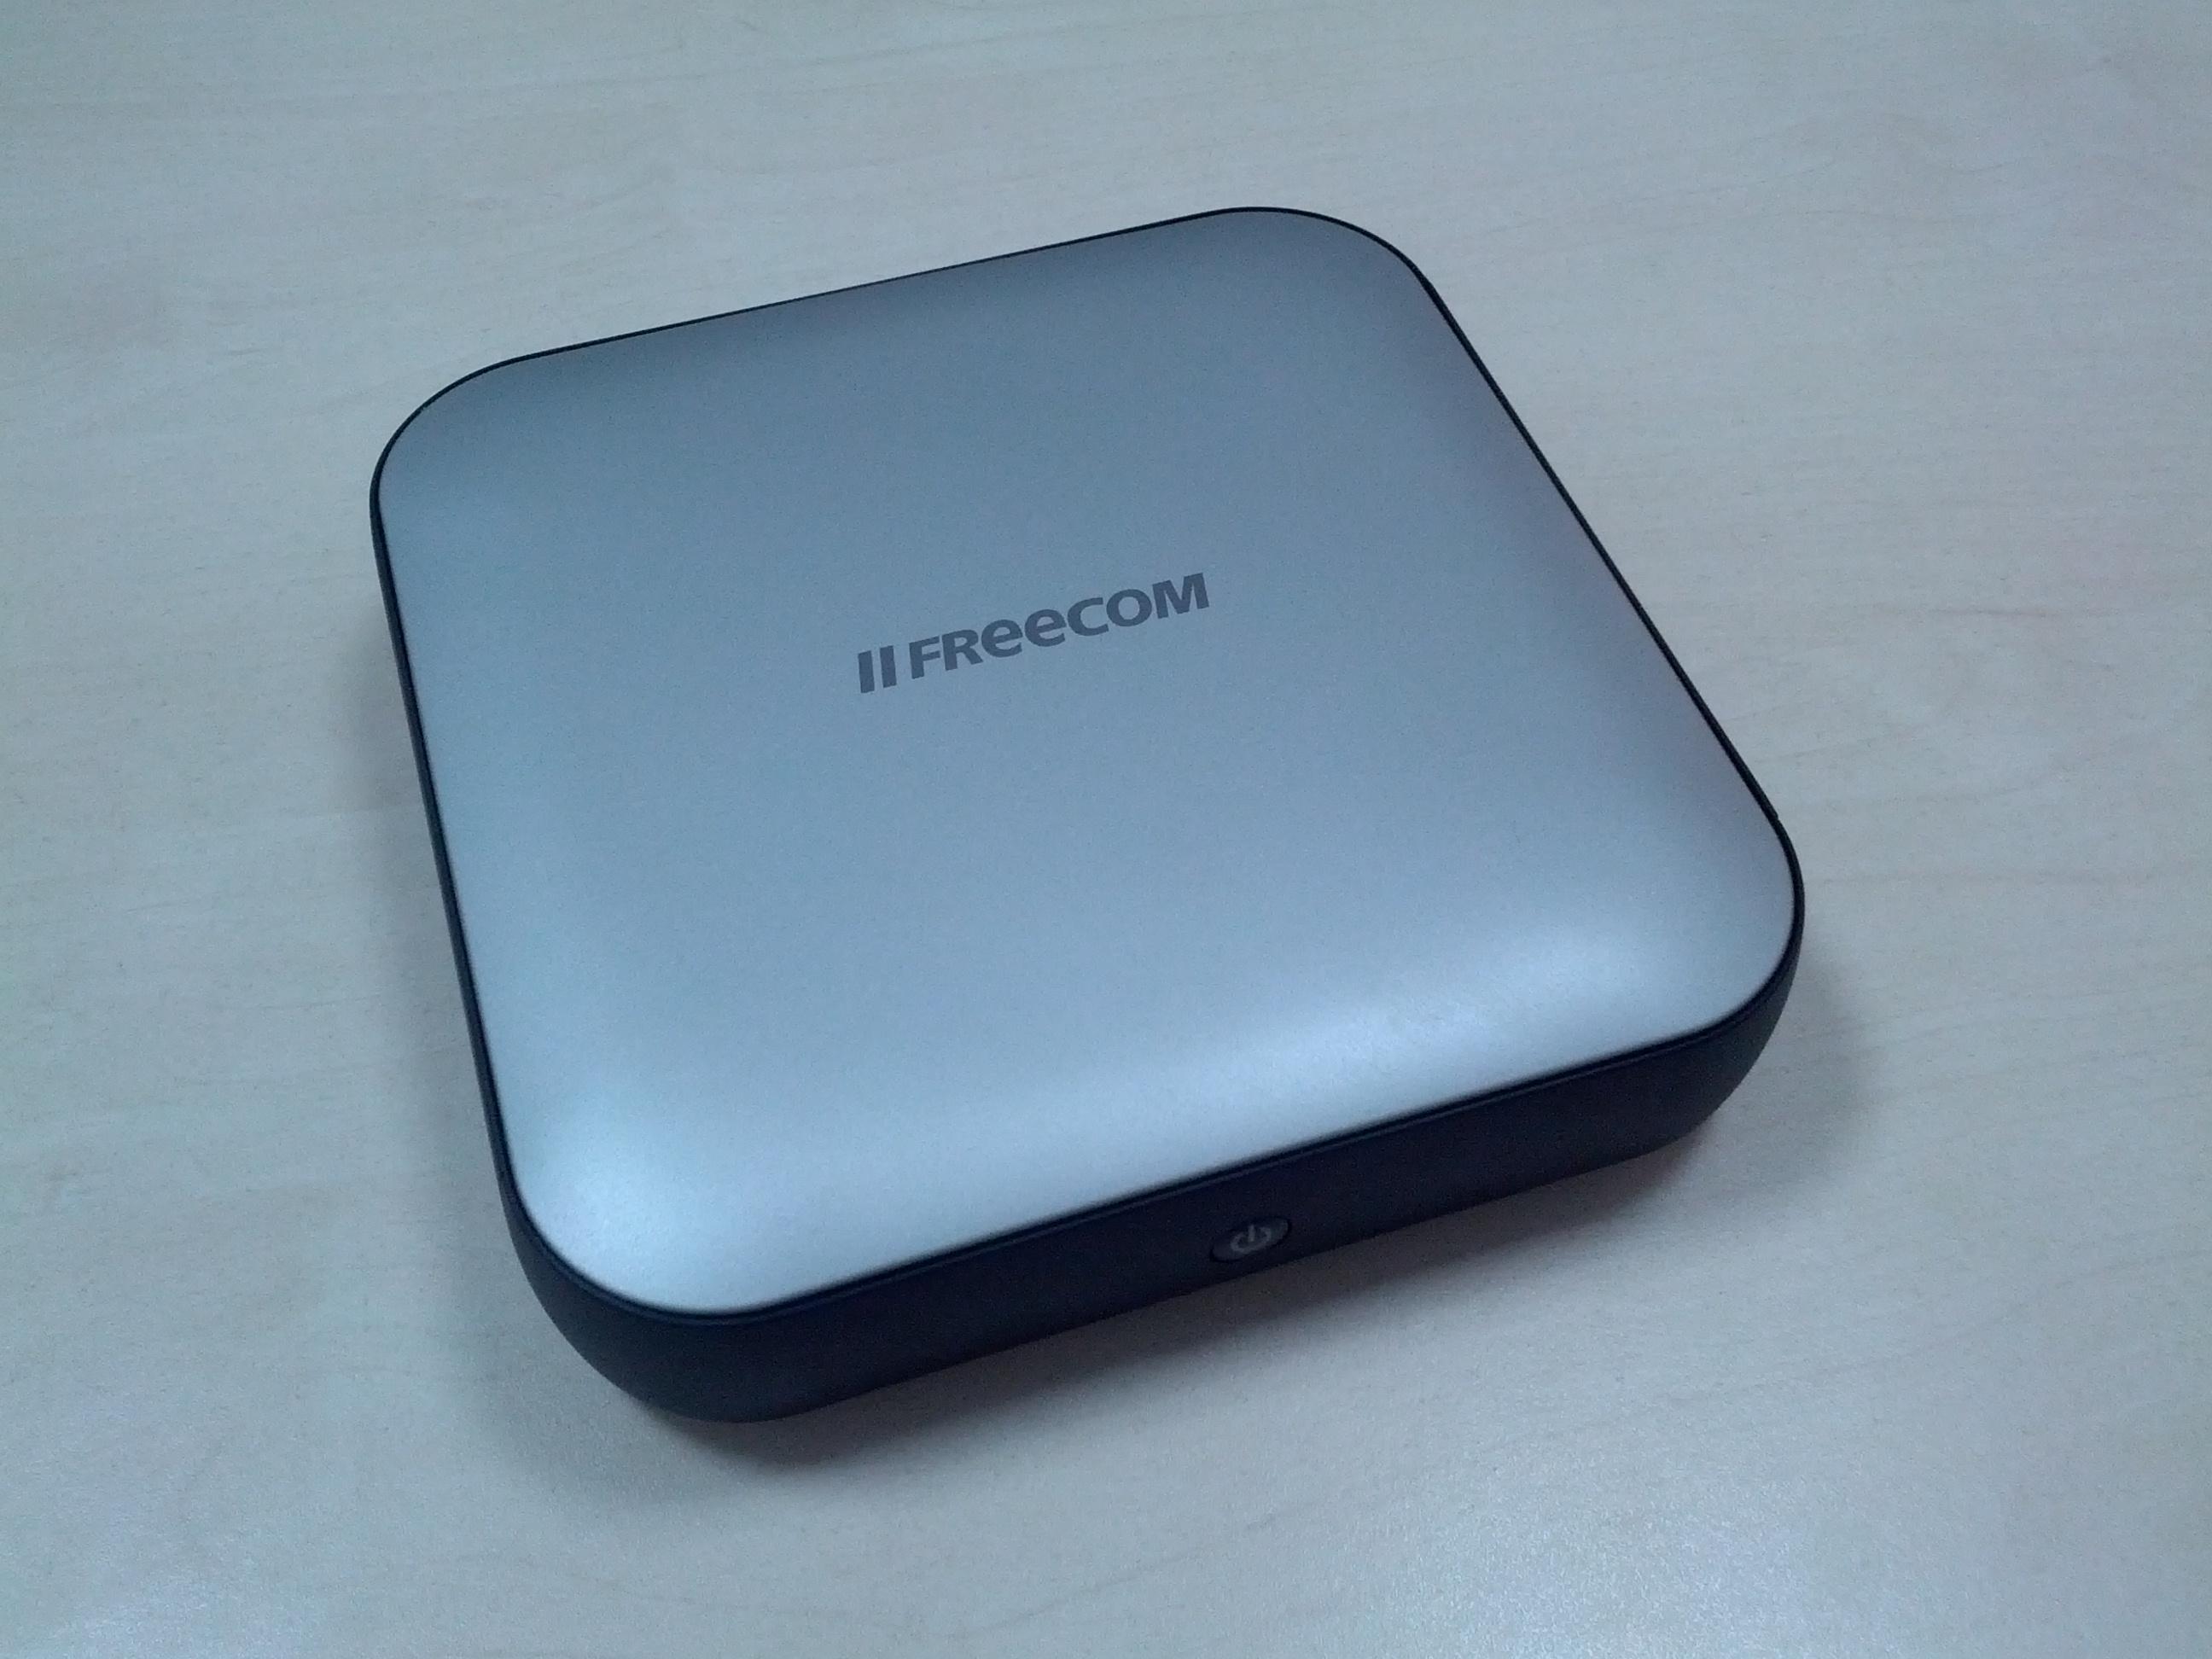 Freecom Hard Drive Sq - общий вид.